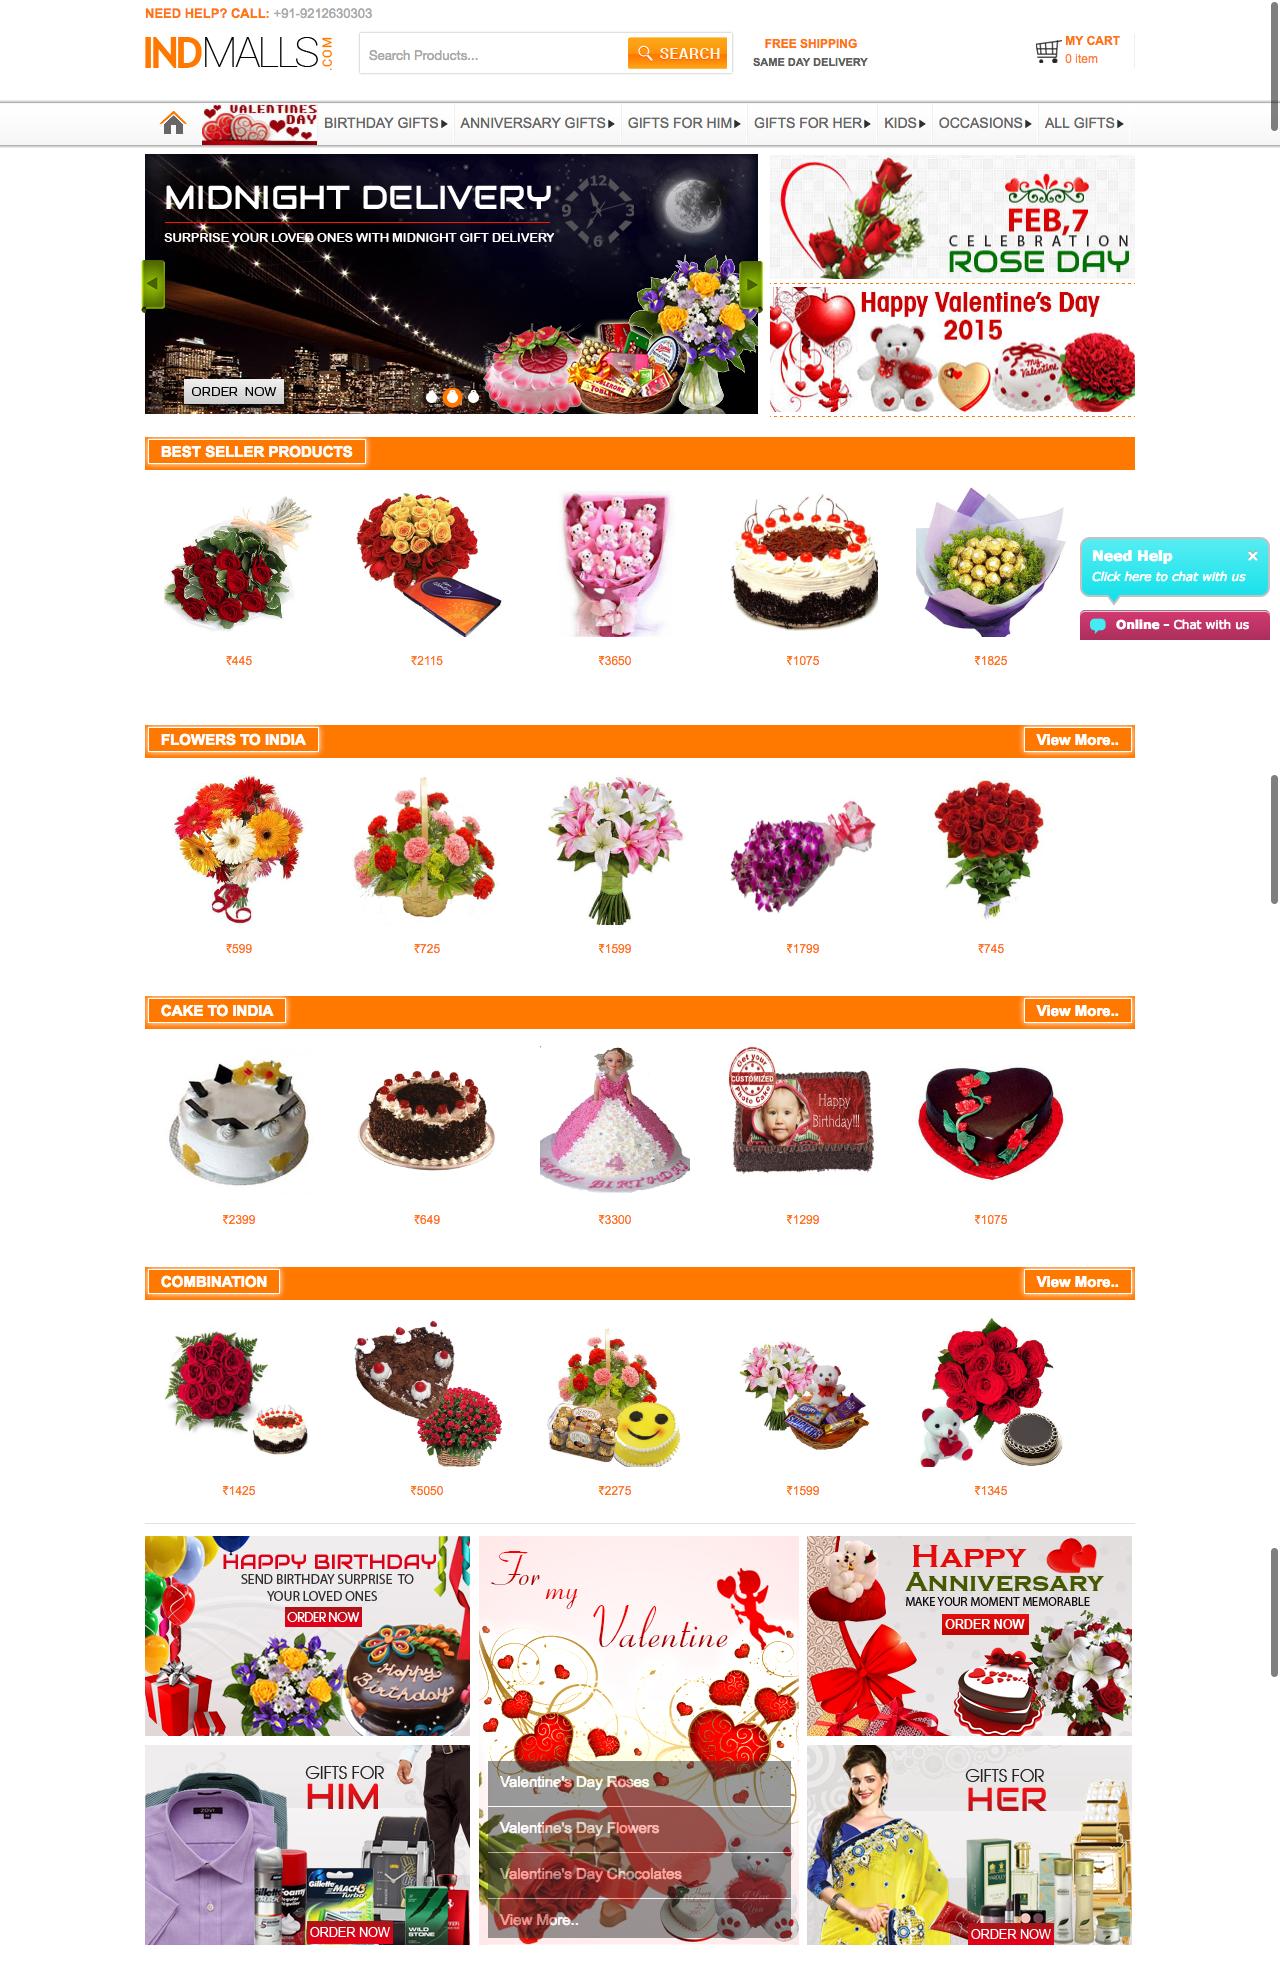 IndMalls.com - Online Gift Shopping